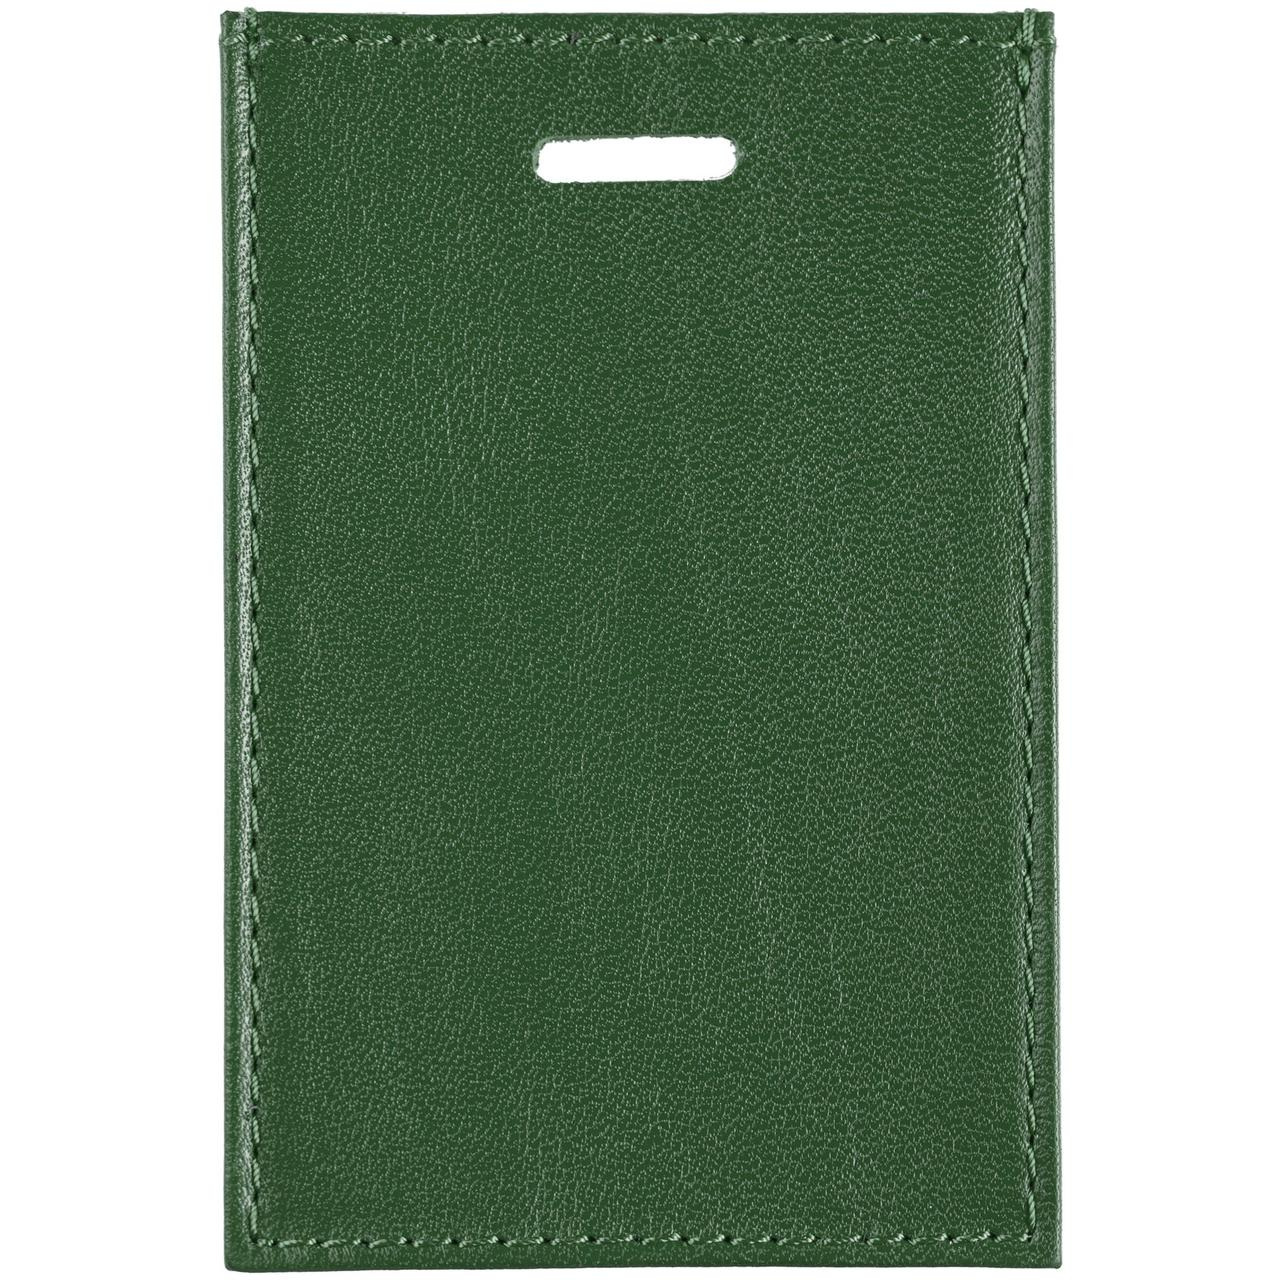 Чехол для карточки Apache, зеленый (артикул 7199.90)